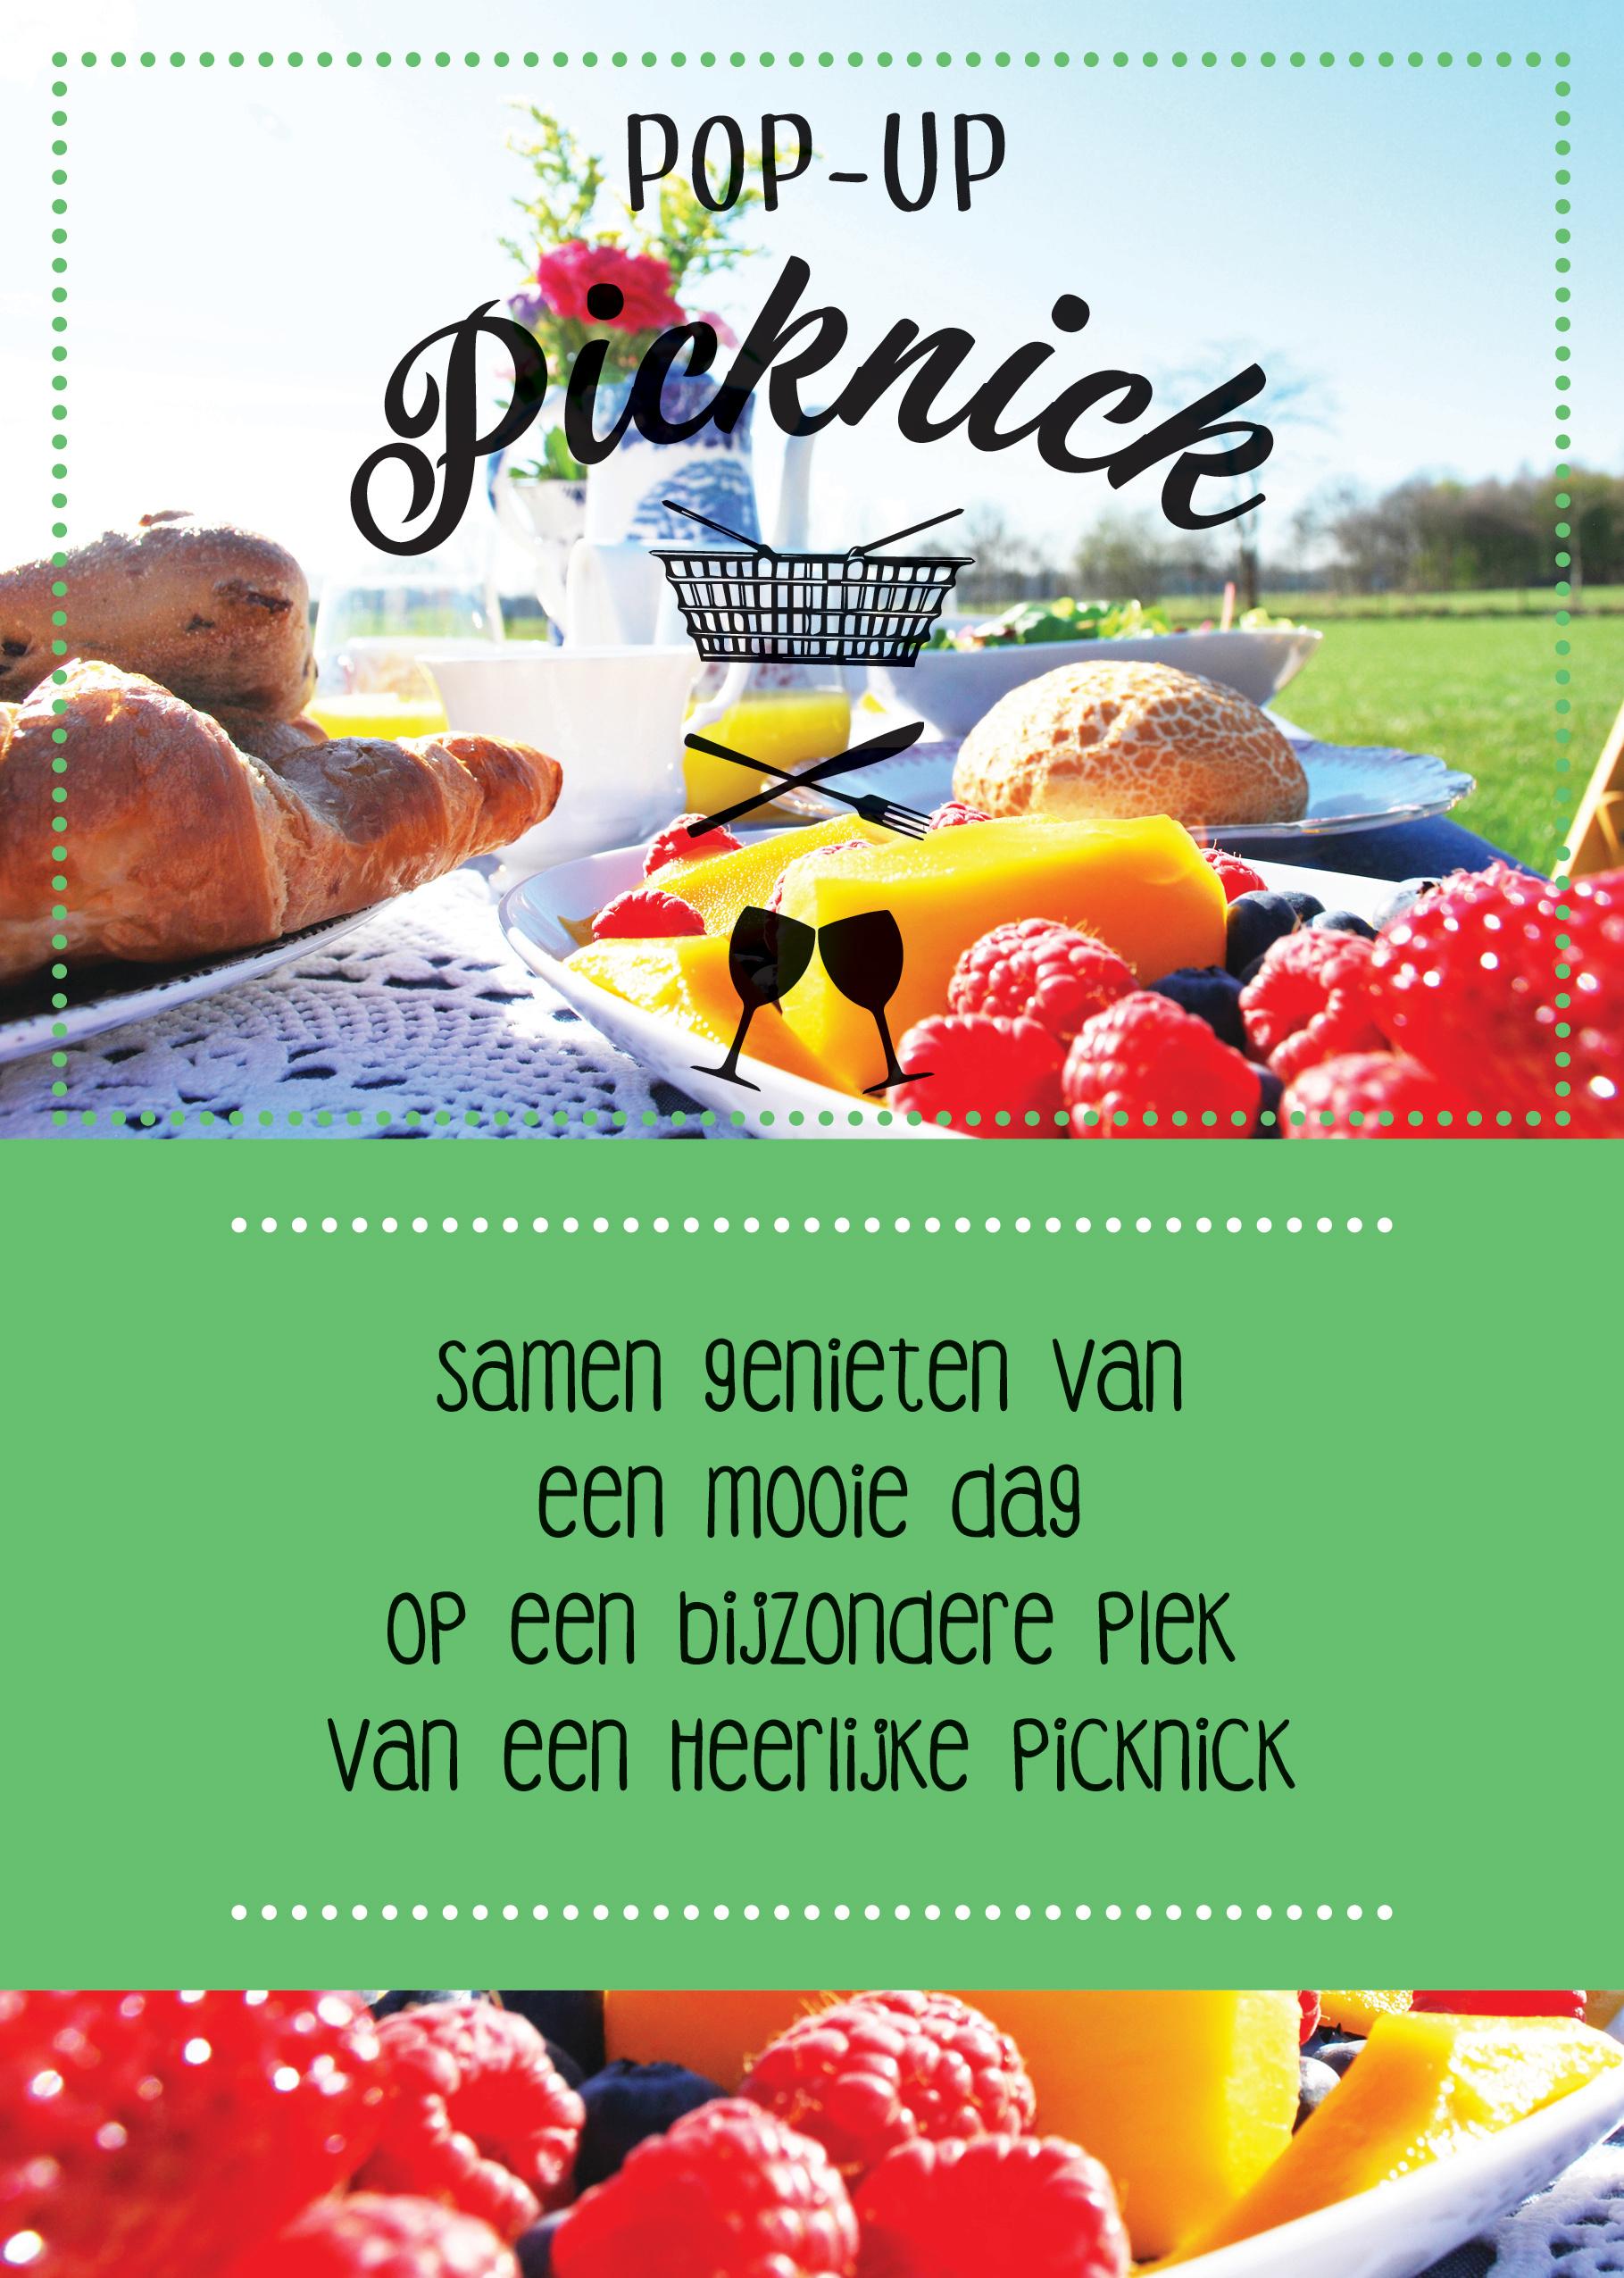 Flyer pop-up-picknick def2